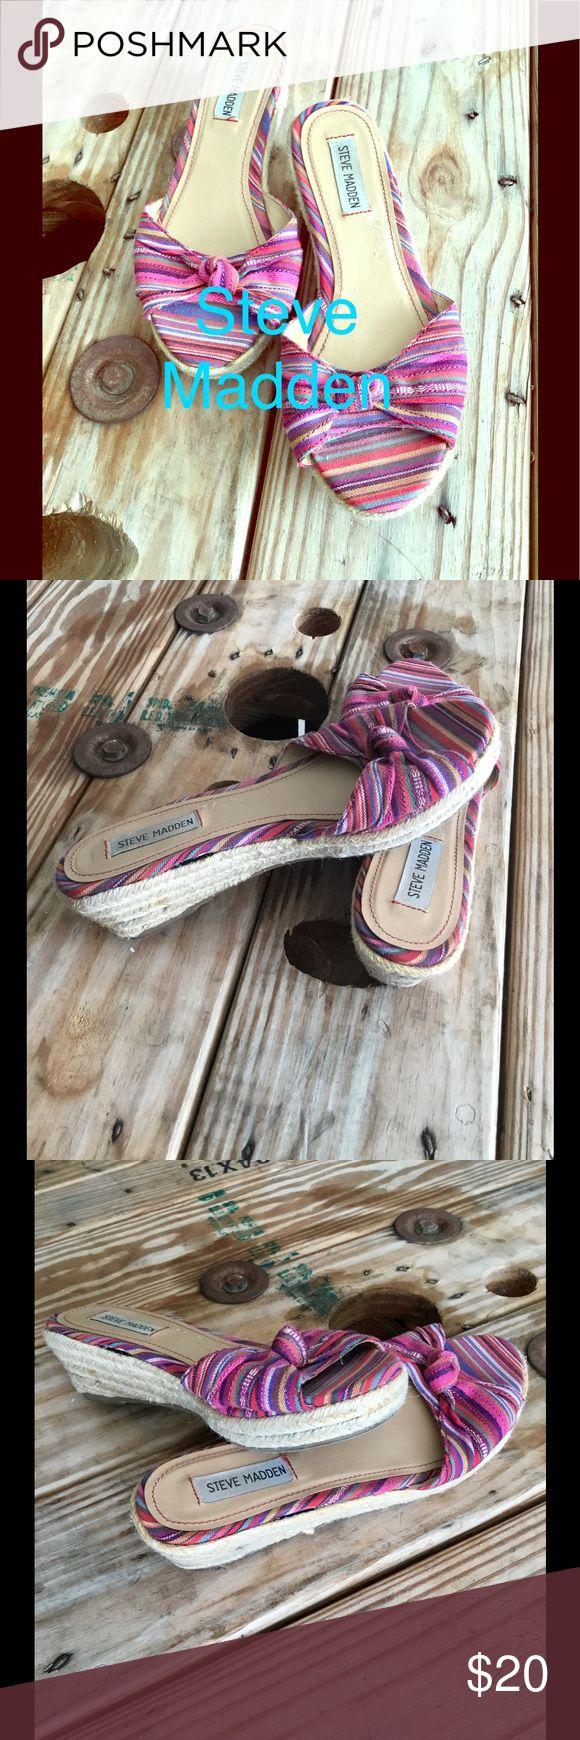 Selling this Steve Madden Wedge Slip-Ons-Good Condition SZ 5 on Poshmark! My username is: just_kota. #shopmycloset #poshmark #fashion #shopping #style #forsale #Steve Madden #Shoes